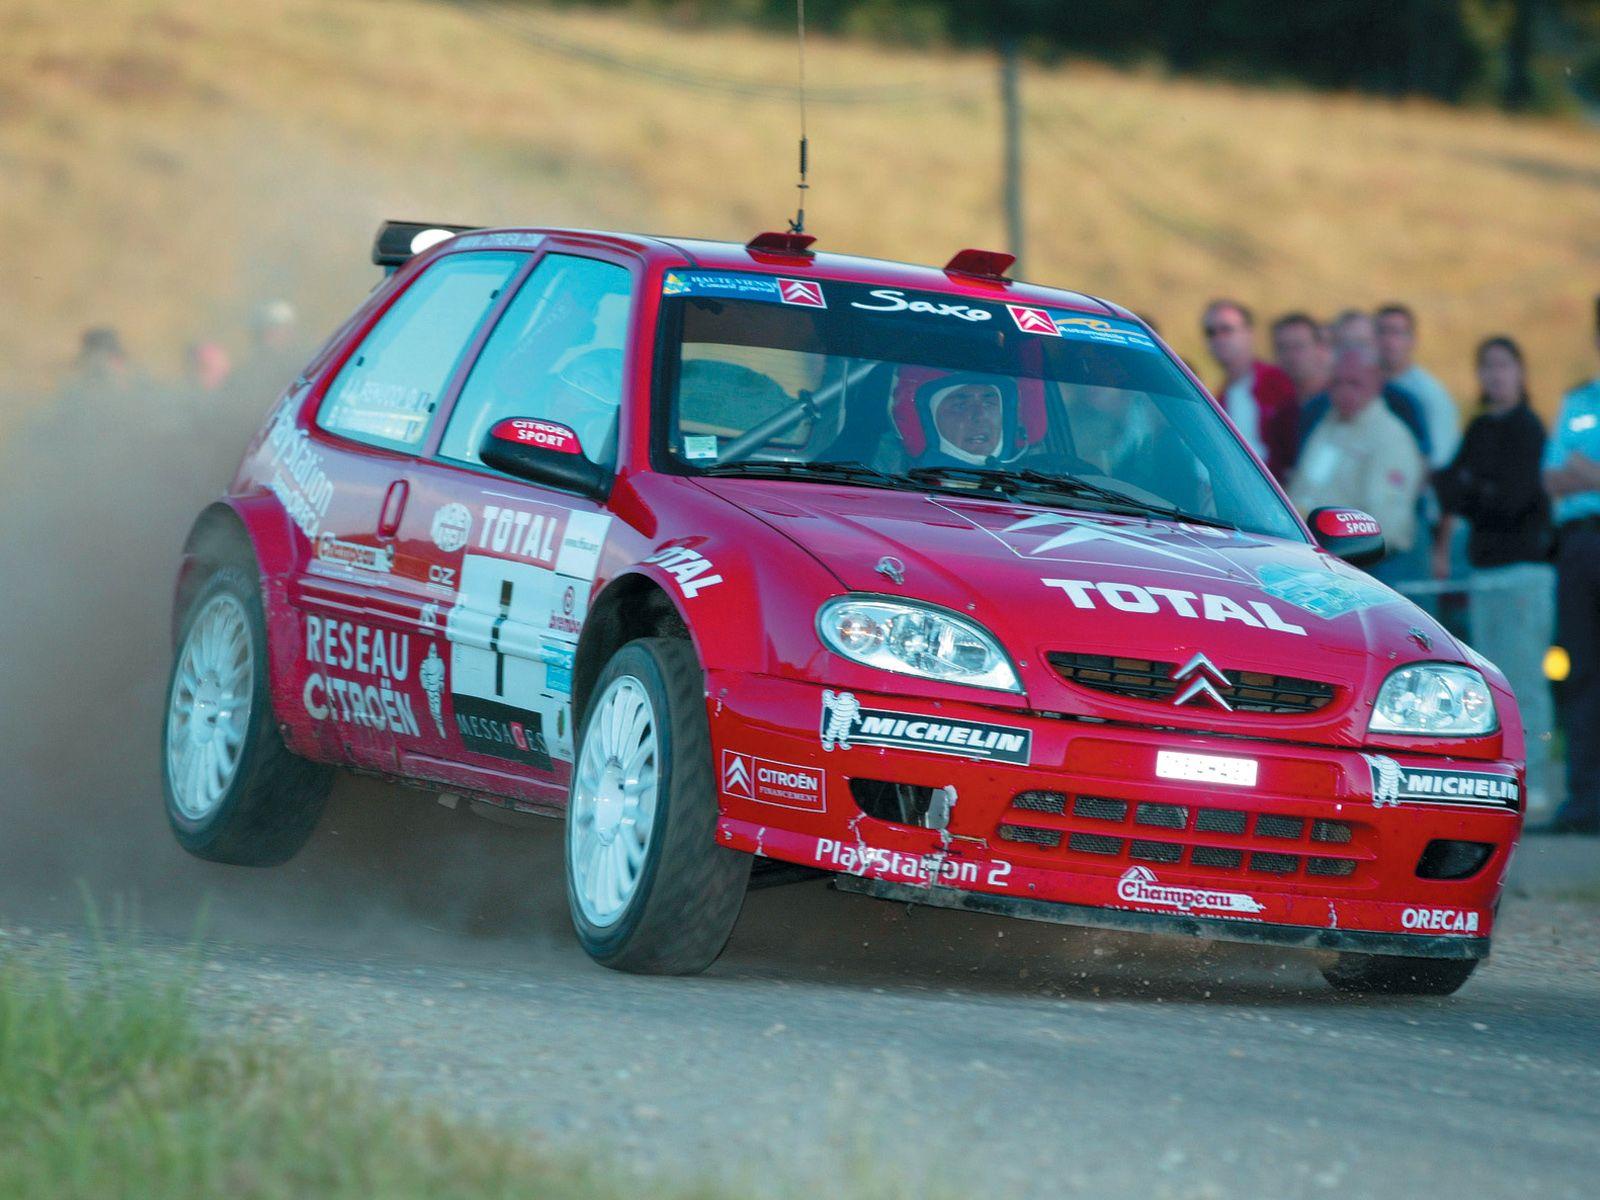 Citroën Saxo Super 1600 Wallpaper And Background Image